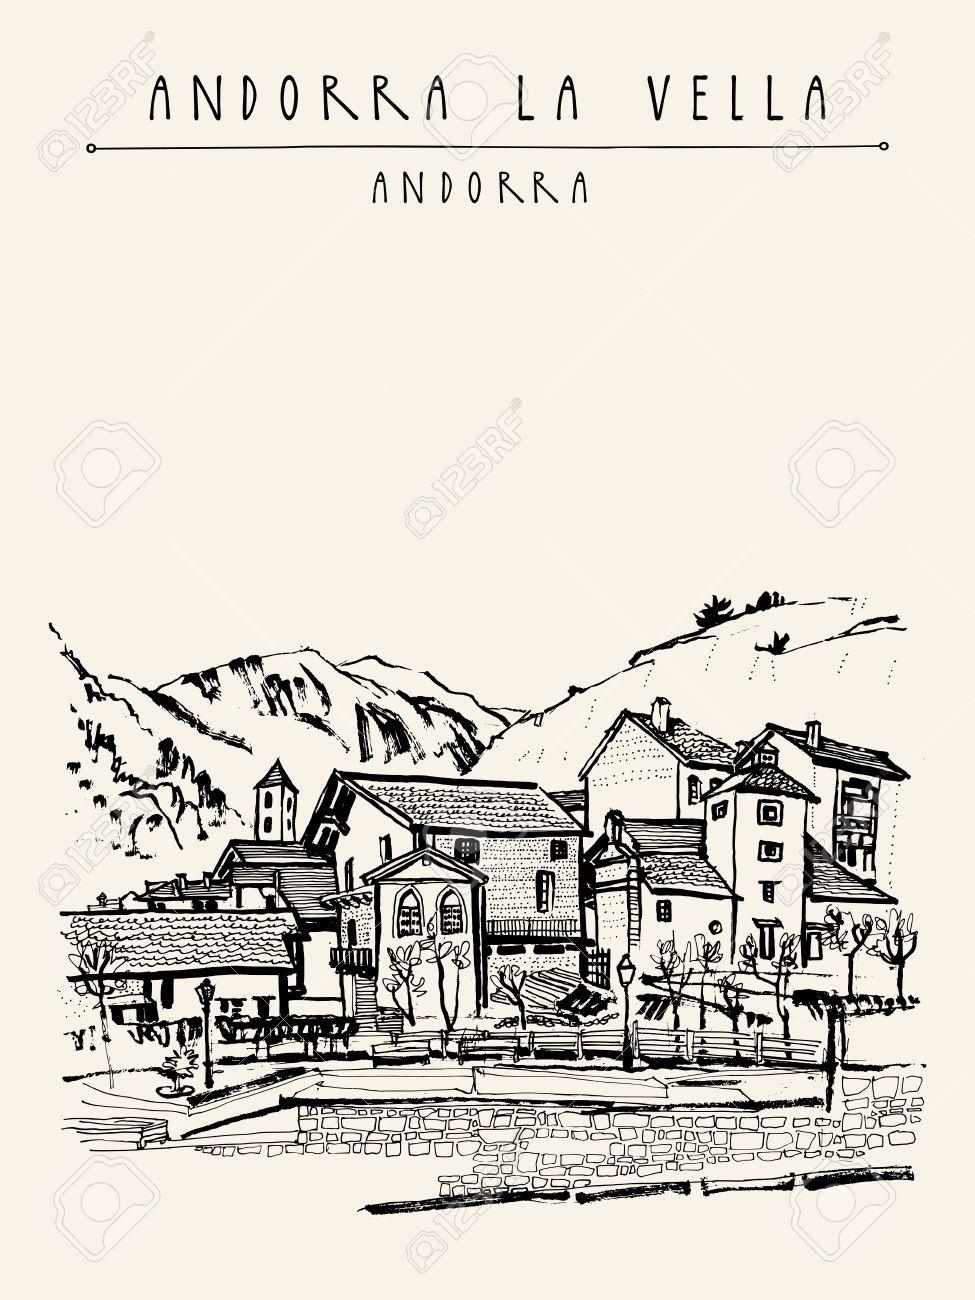 975x1300 Andorra La Vella, Capital Of Andorra, Europe. Cozy European Town